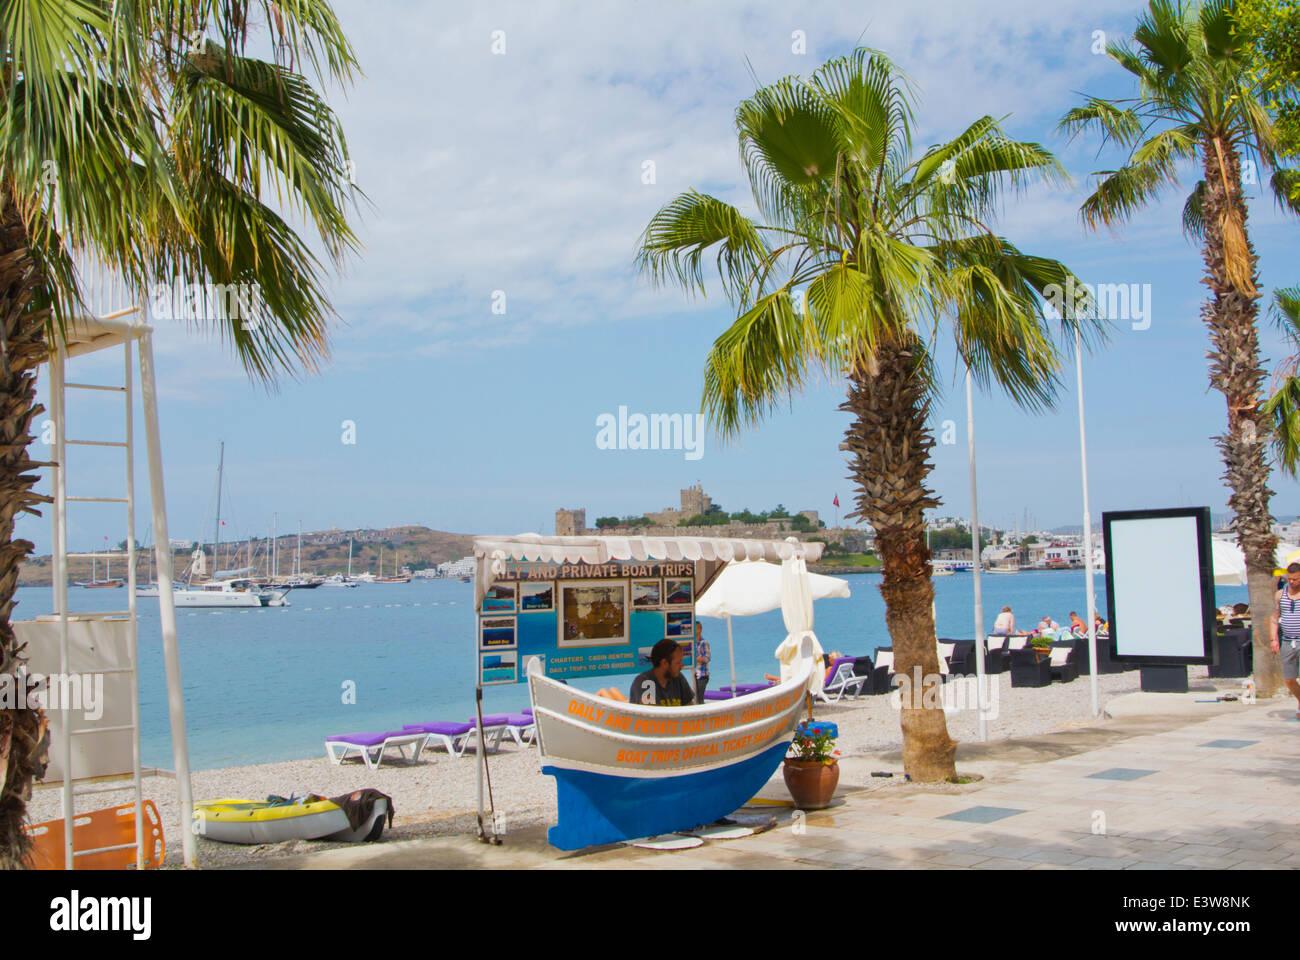 Agenzia di viaggi viaggio in barca booth, Cumhuriyet mare street, Bodrum, Mugla regione, Turchia occidentale, Asia Immagini Stock